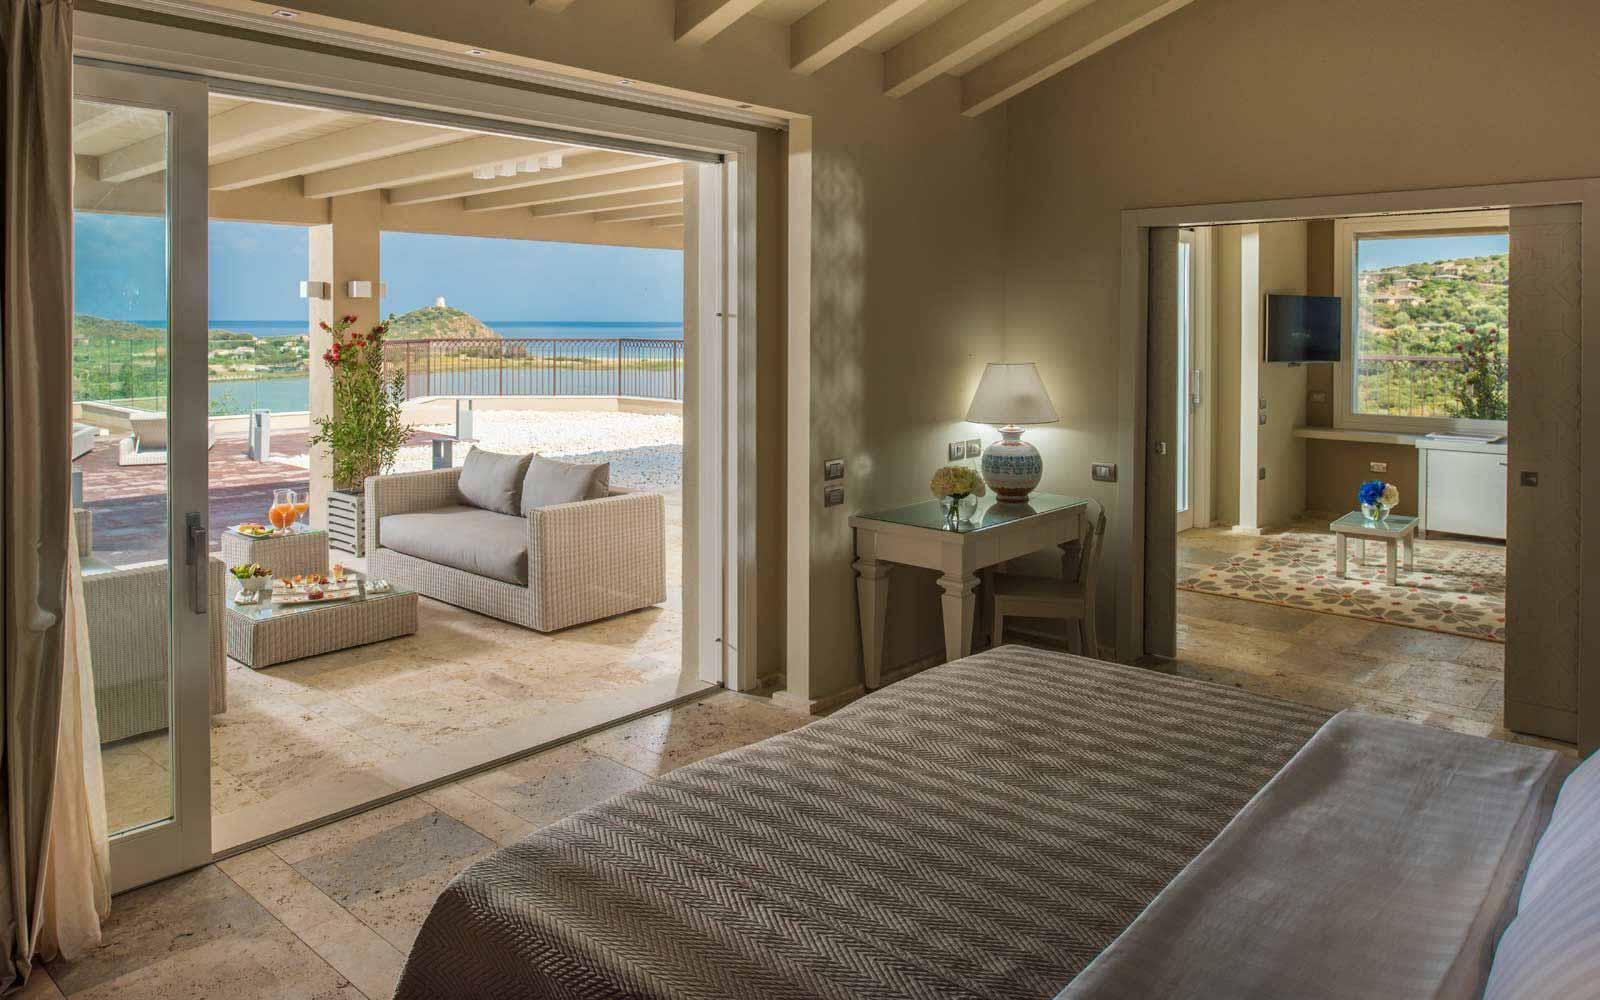 Luxury Panorama Suite Bedroom at Hotel Laguna